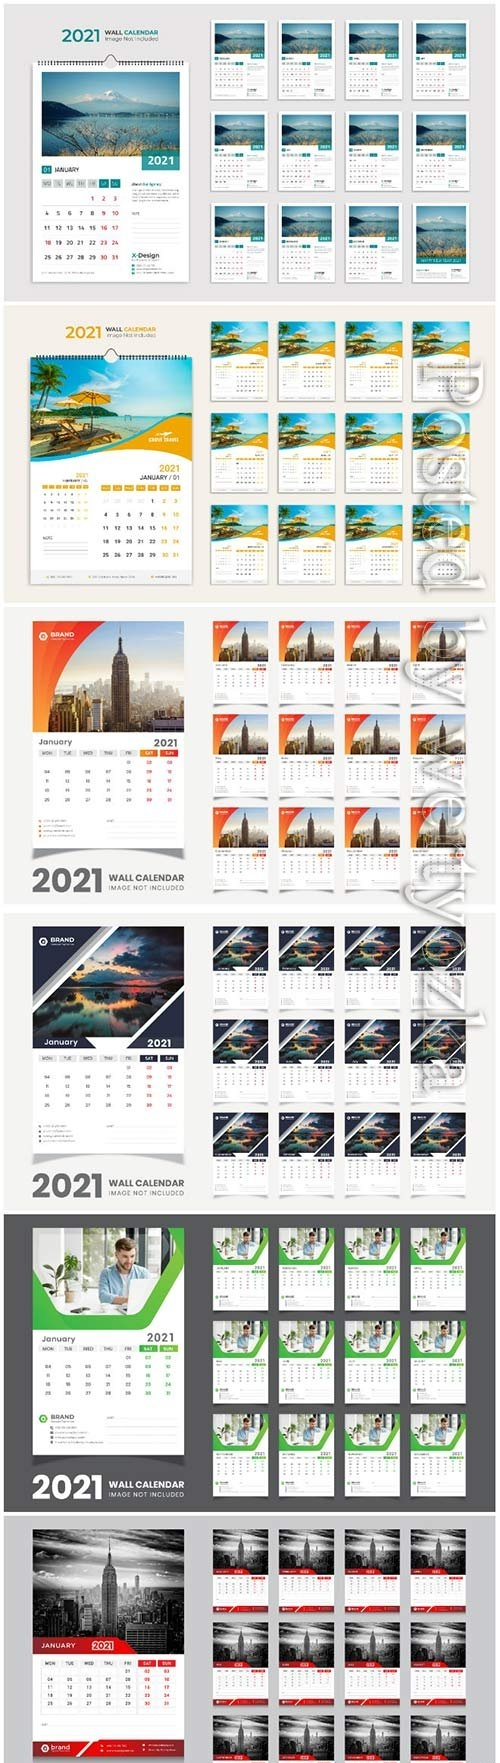 Desk calendar 2021 template design for new year vol 3